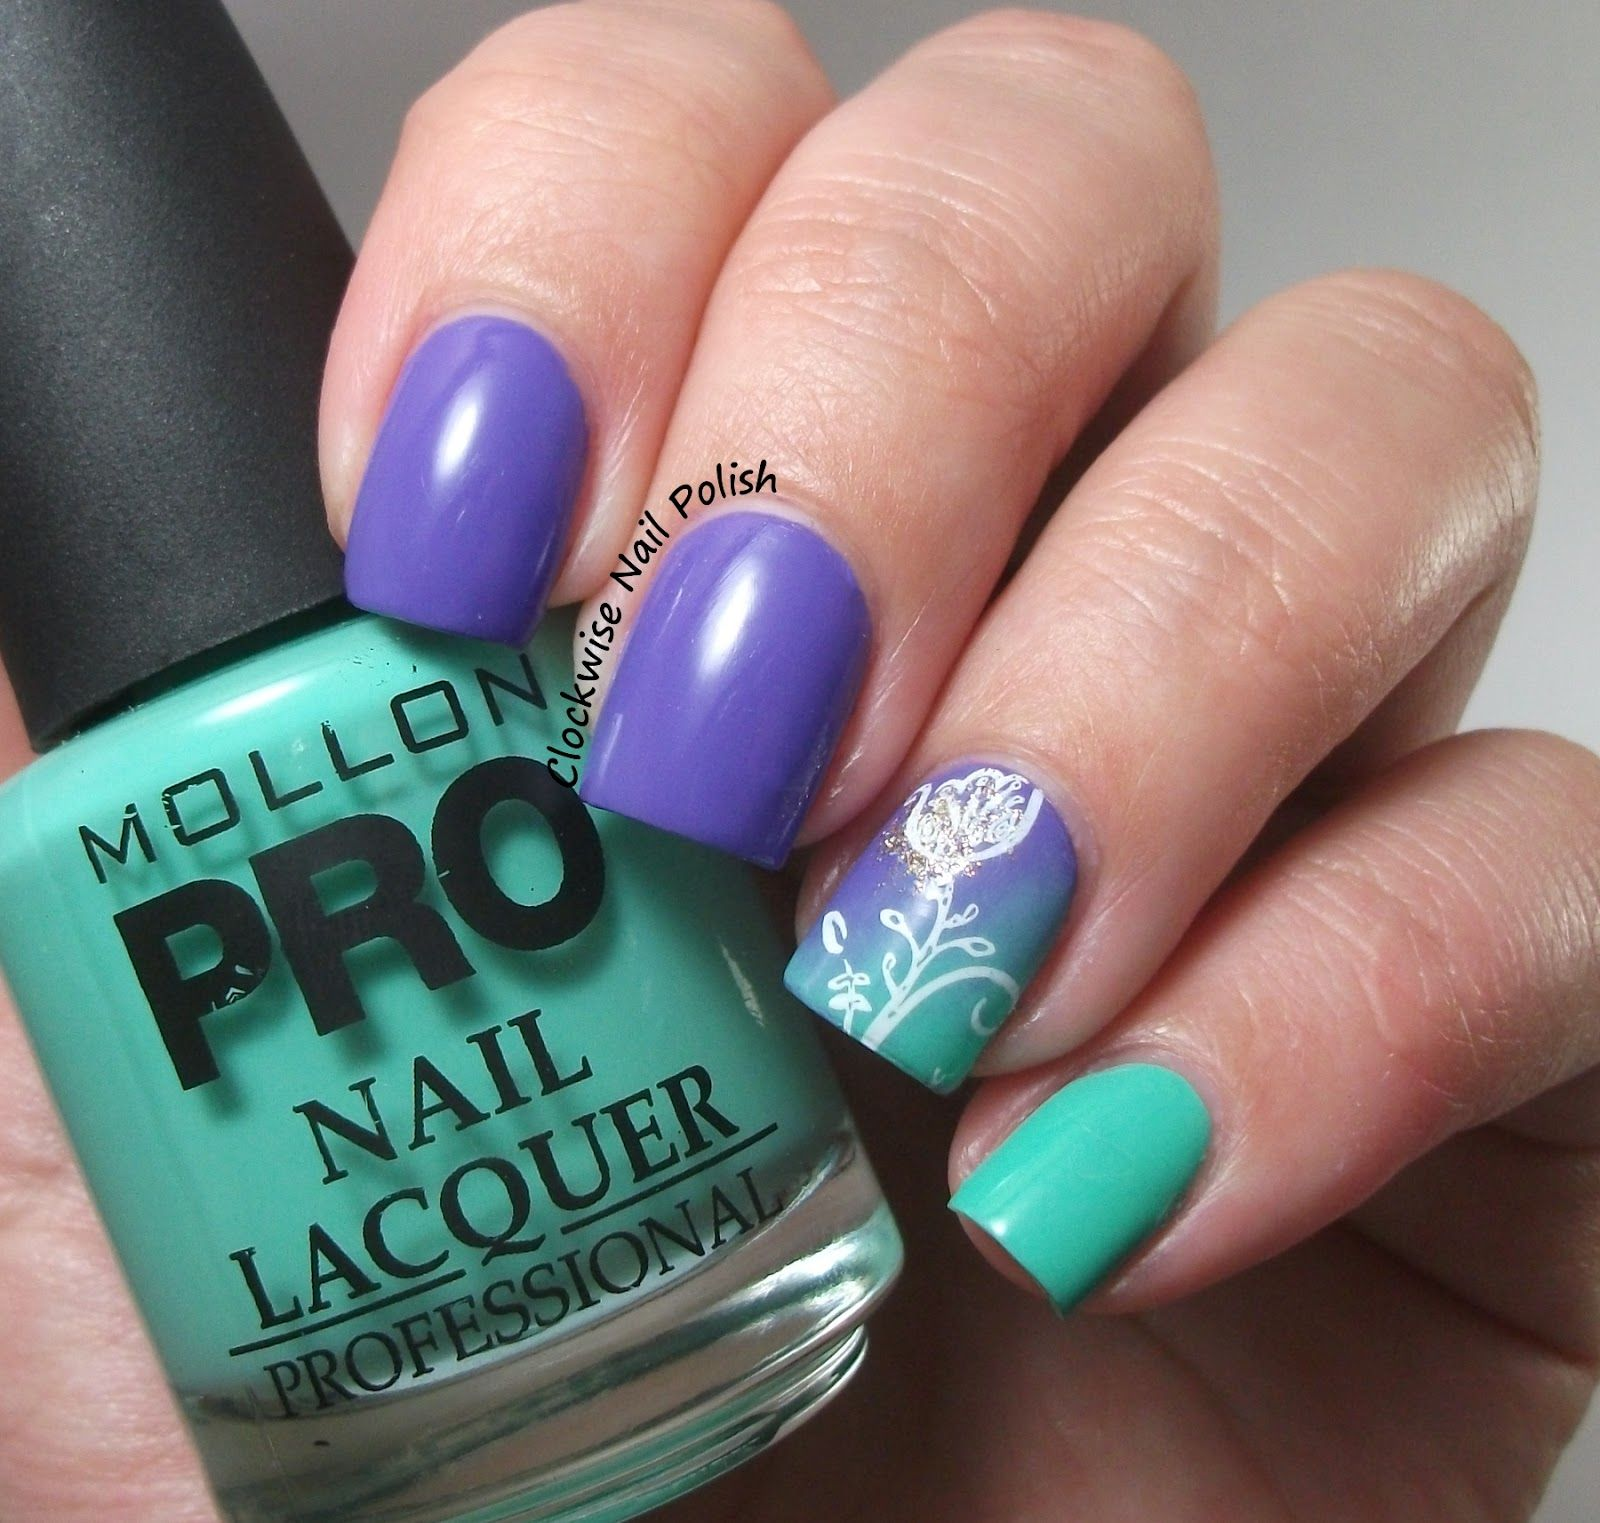 The Clockwise Nail Polish: Mollon Pro 188 Delicious & 193 Sparkle